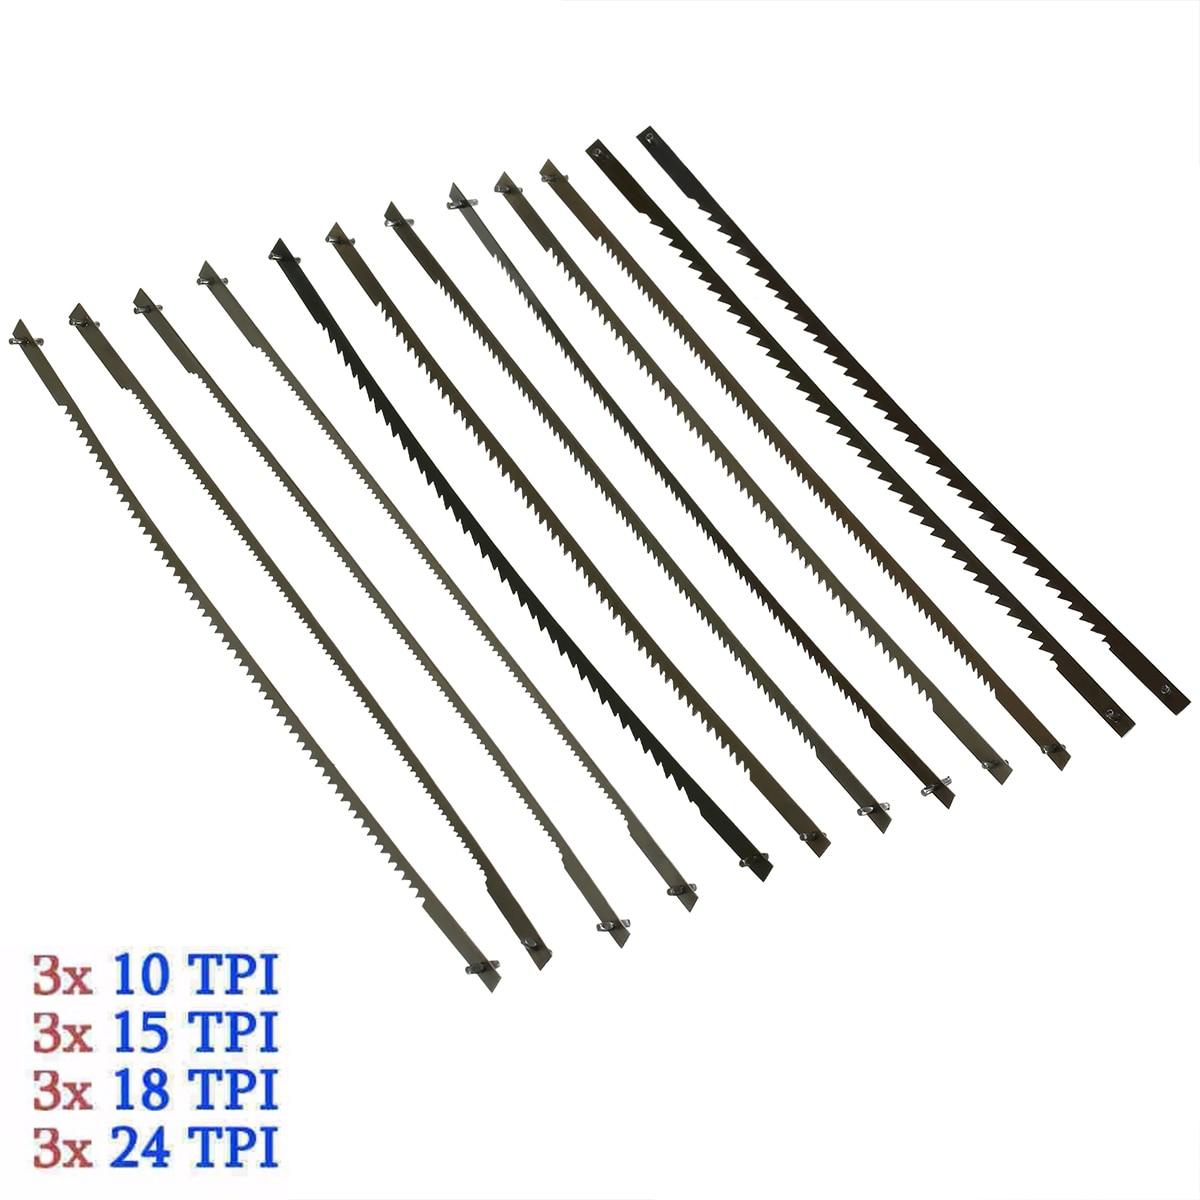 12Pcs Pinned Scroll Saw Blades 10/15/18/24 Teeth Black Woodworking Power Tools Accessories 127mm Mayitr